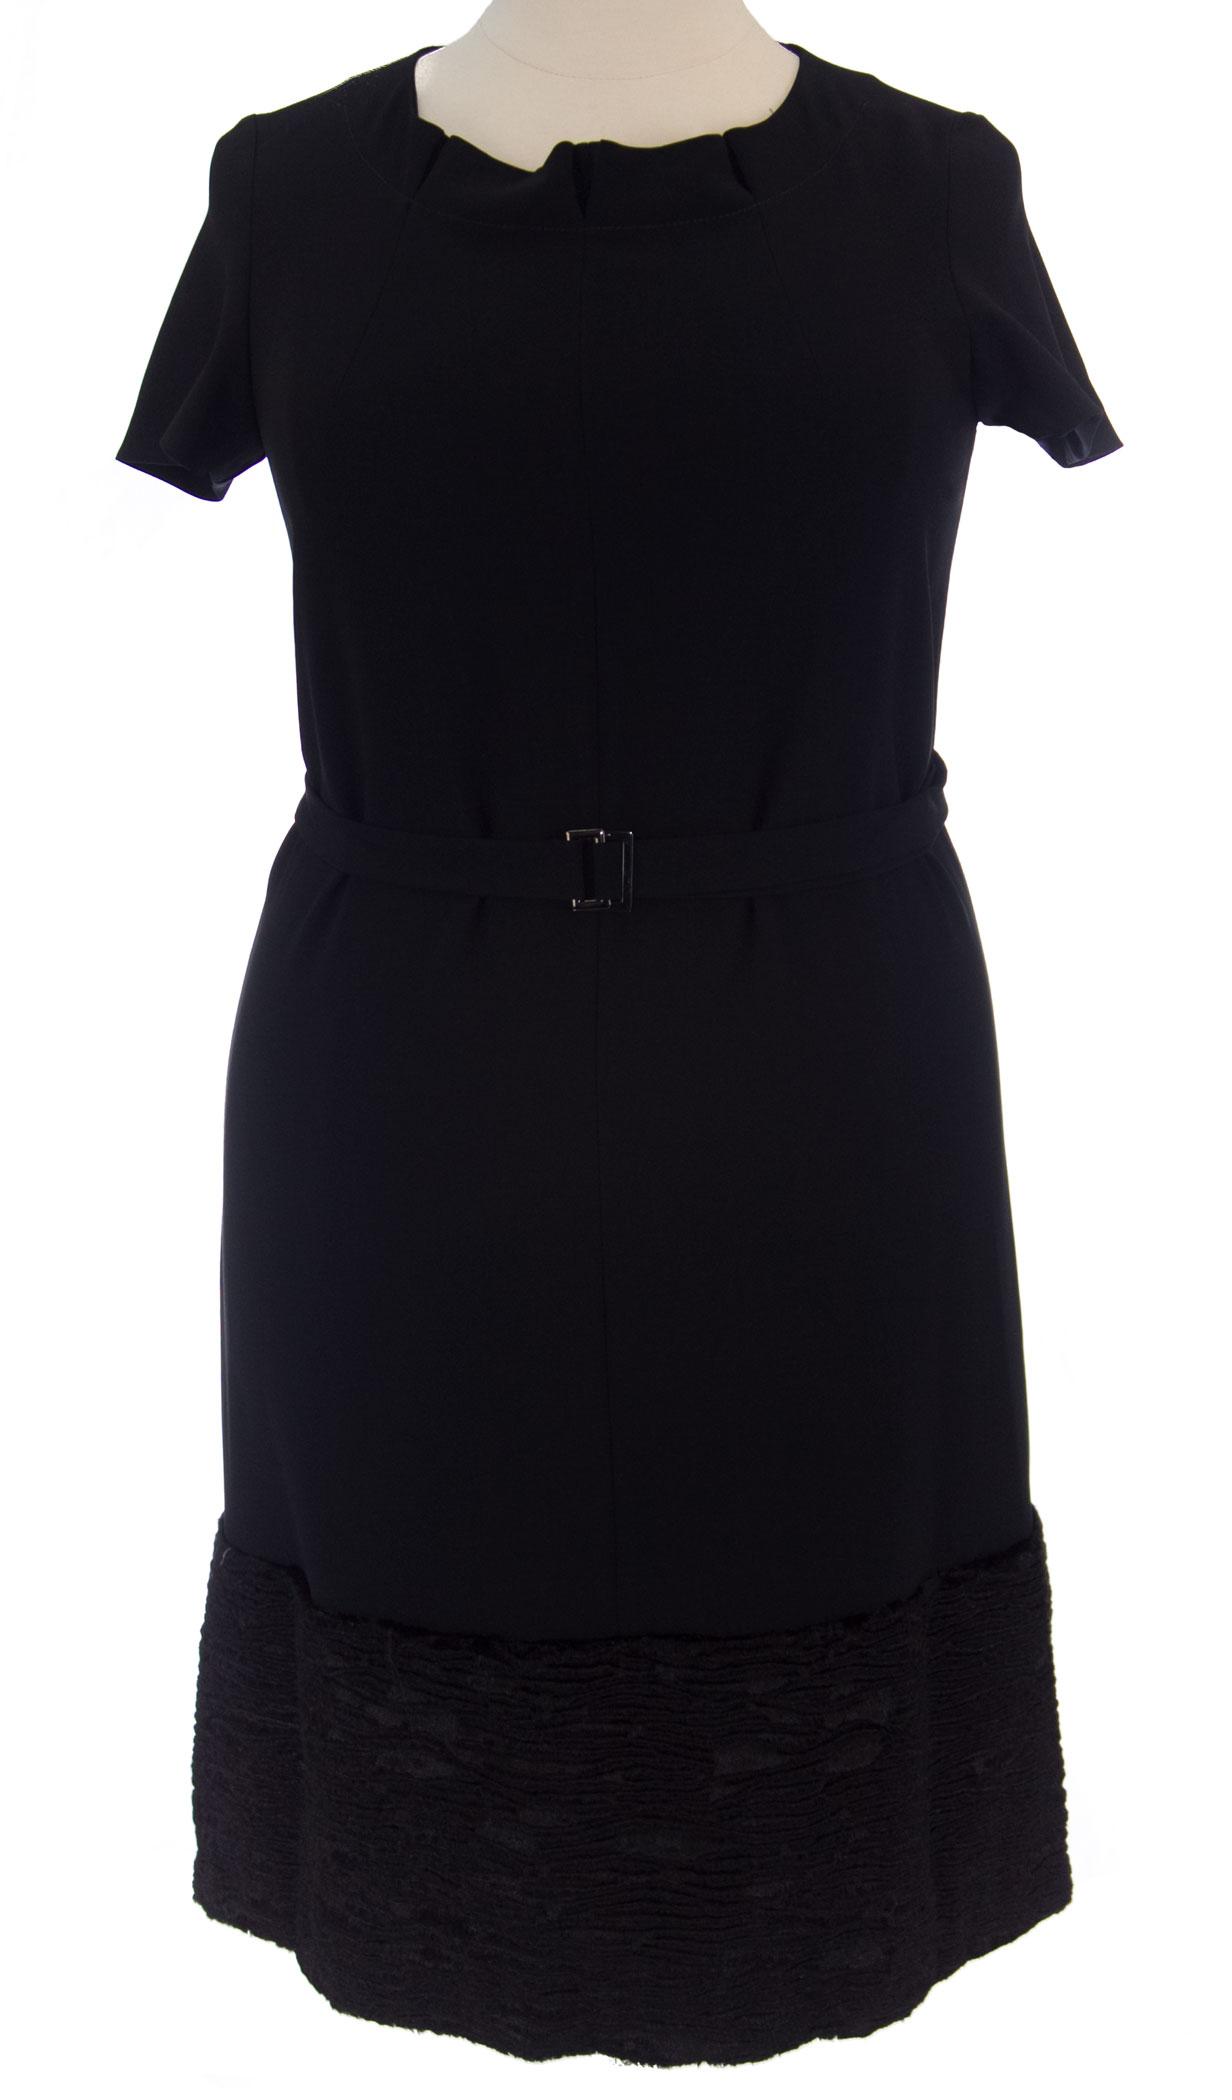 MARINA RINALDI by MaxMara Limer schwarz Short Sleeve Dress w  Belt  12W   21